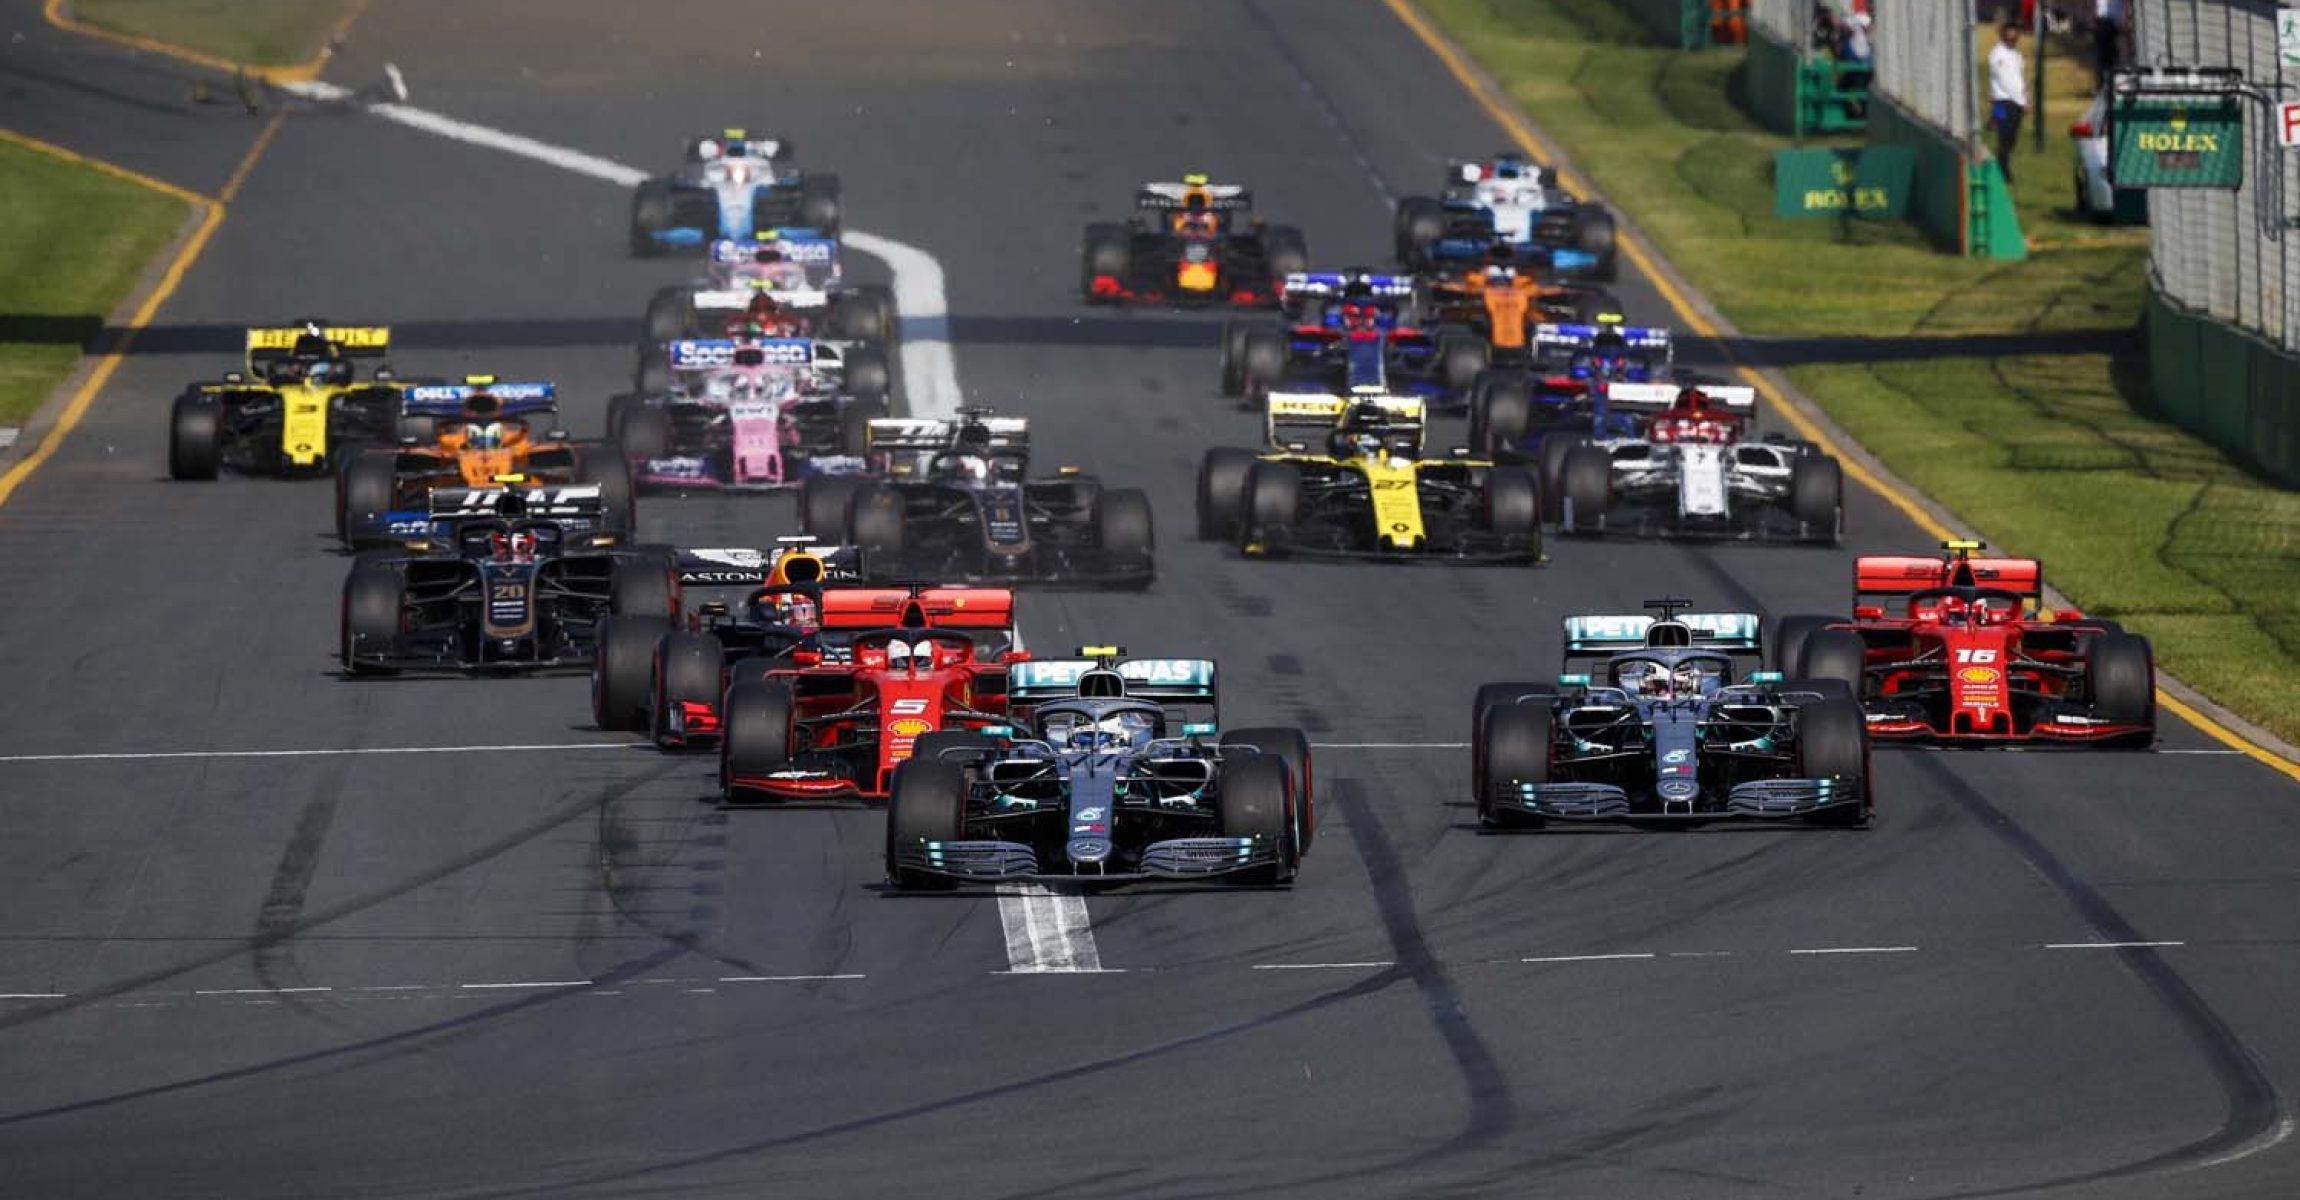 2019 Australian Grand Prix, Sunday - Wolfgang Wilhelm Melbourne, start,